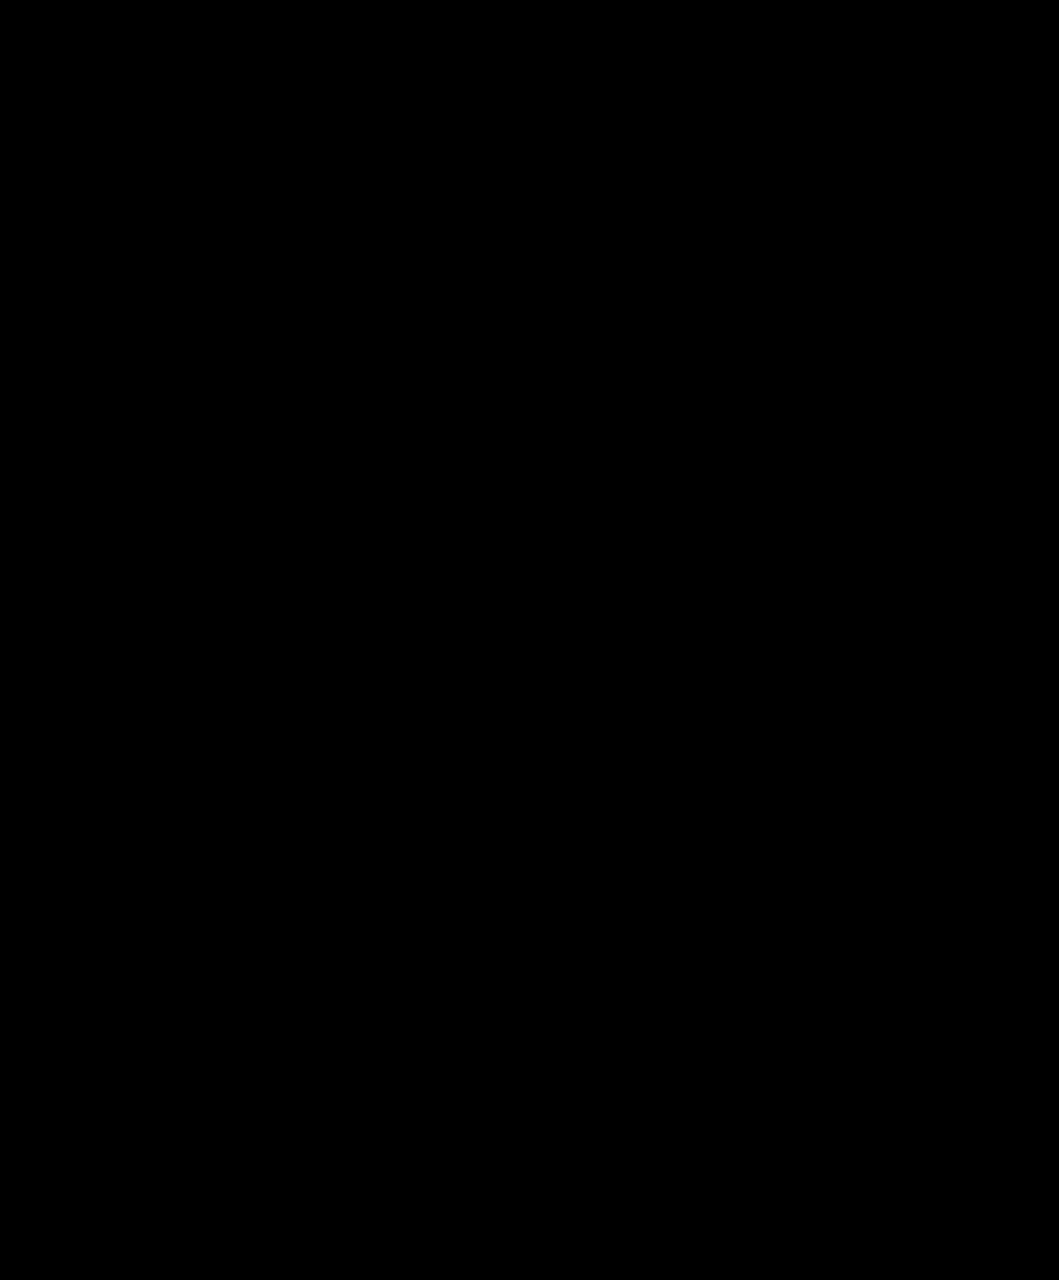 binary, digital, vortex-5389555.jpg